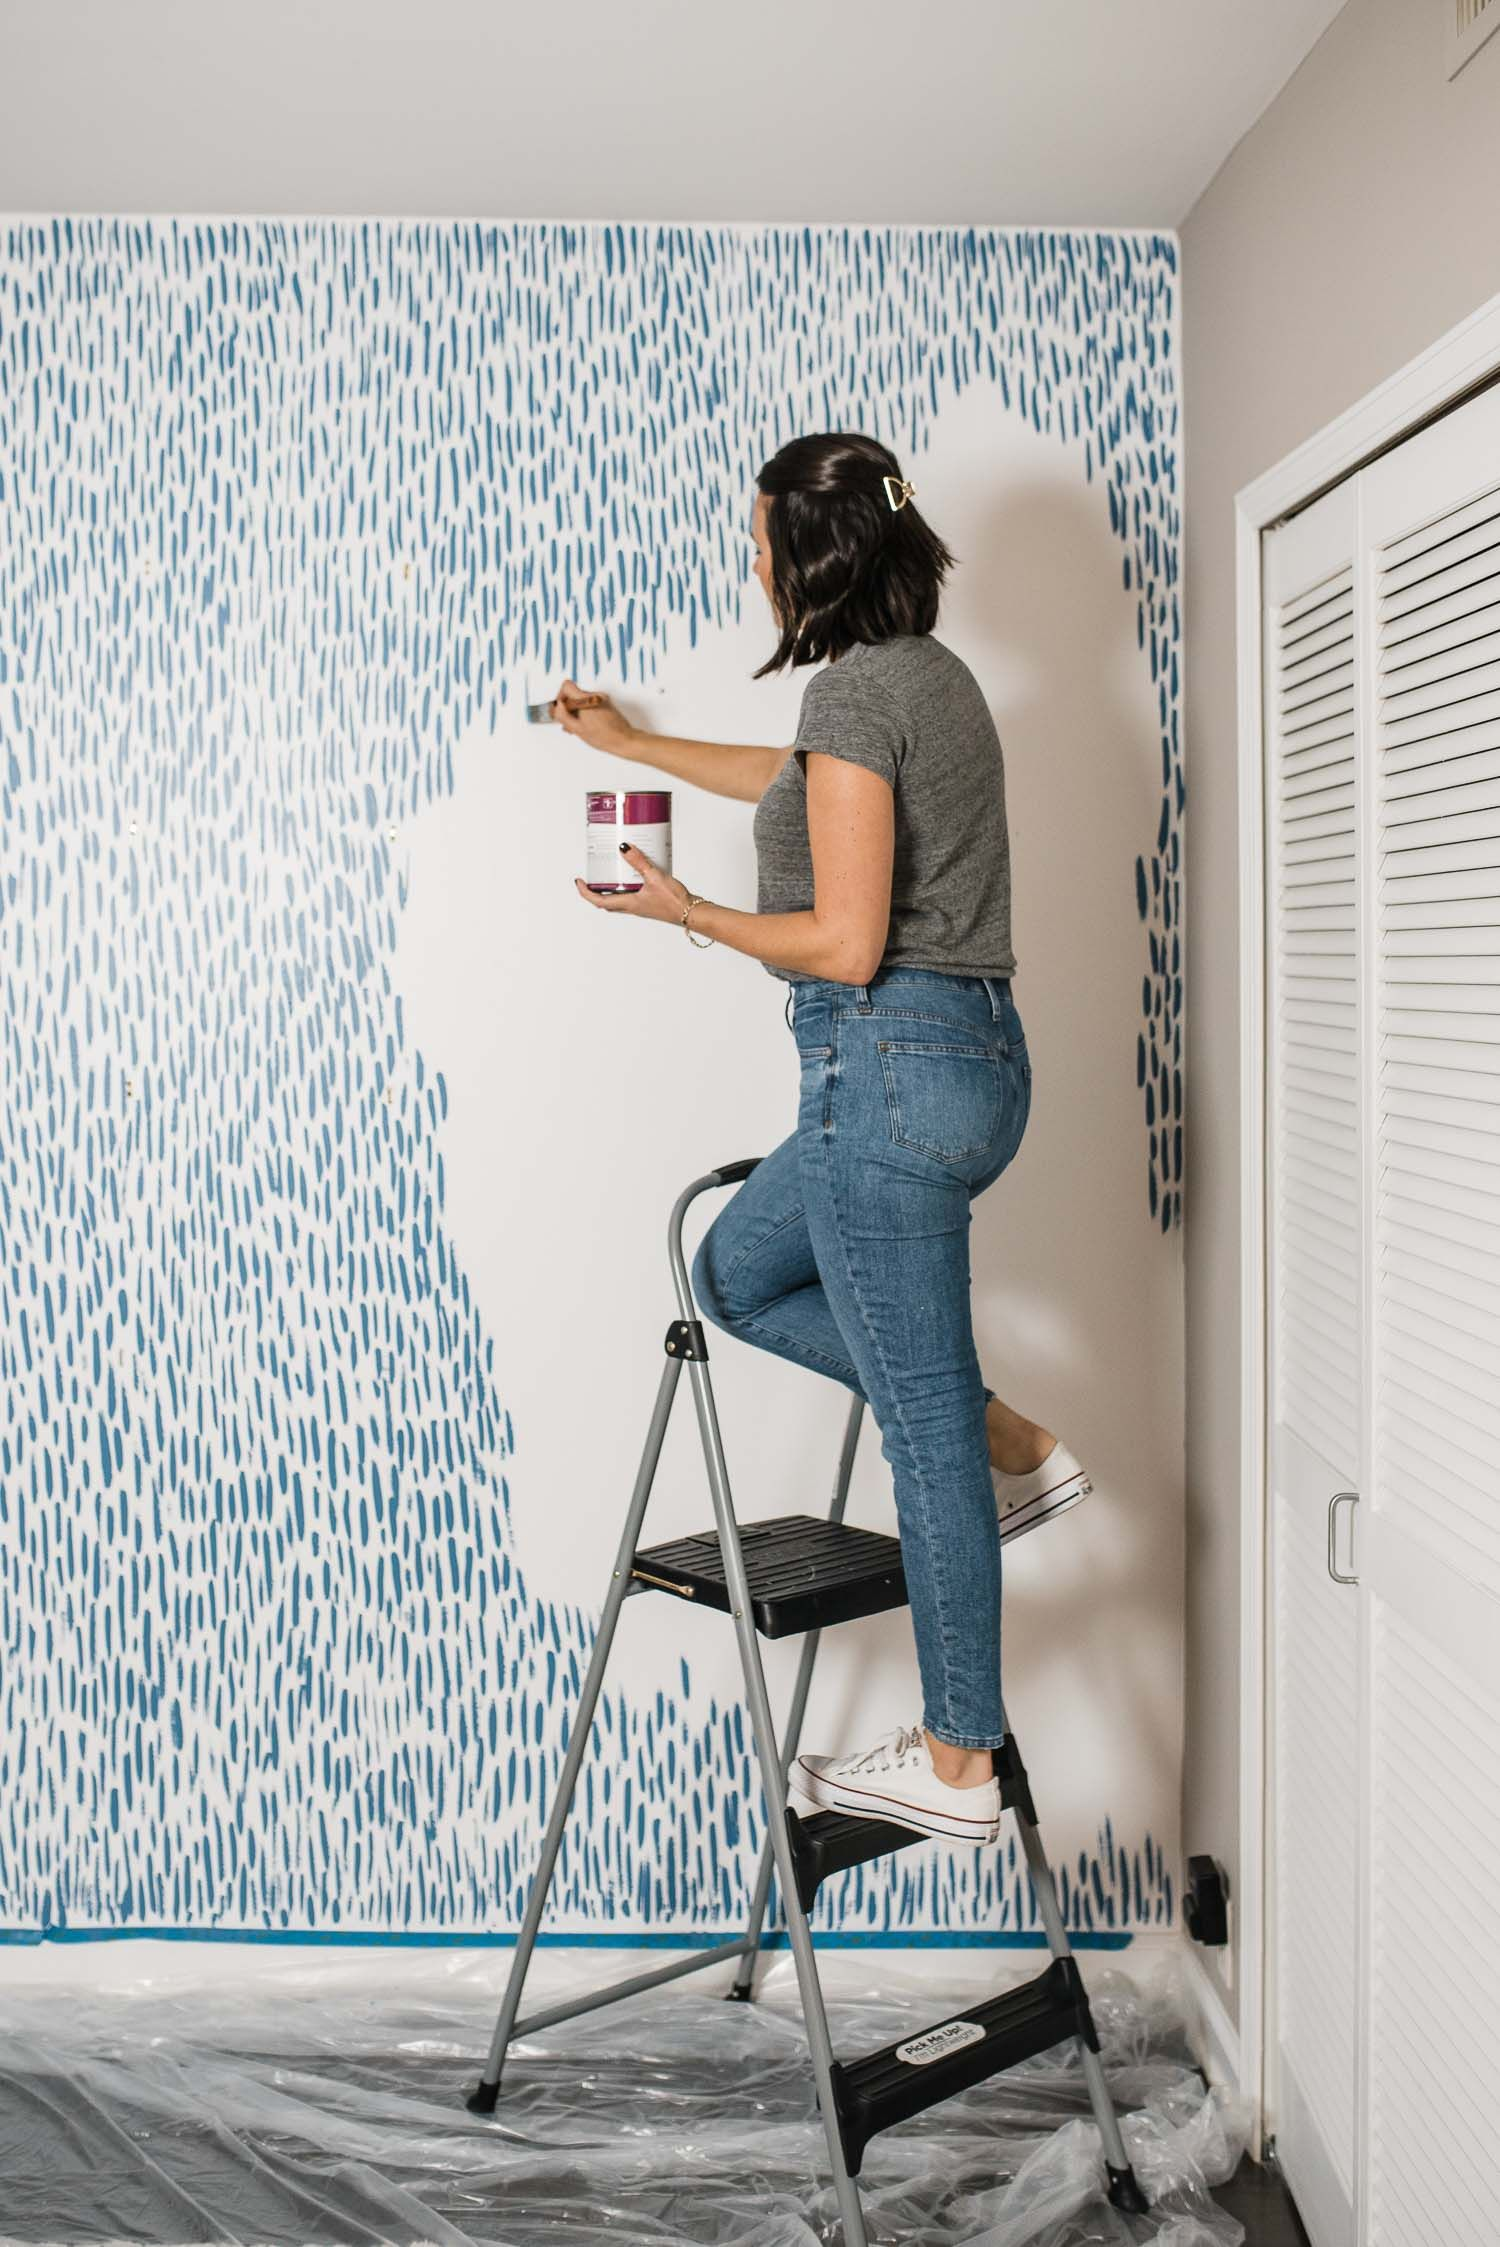 Diy Brushstroke Accent Wall Tutorial My Style Vita In 2020 Bedroom Diy Diy Bedroom Decor Diy Accent Wall